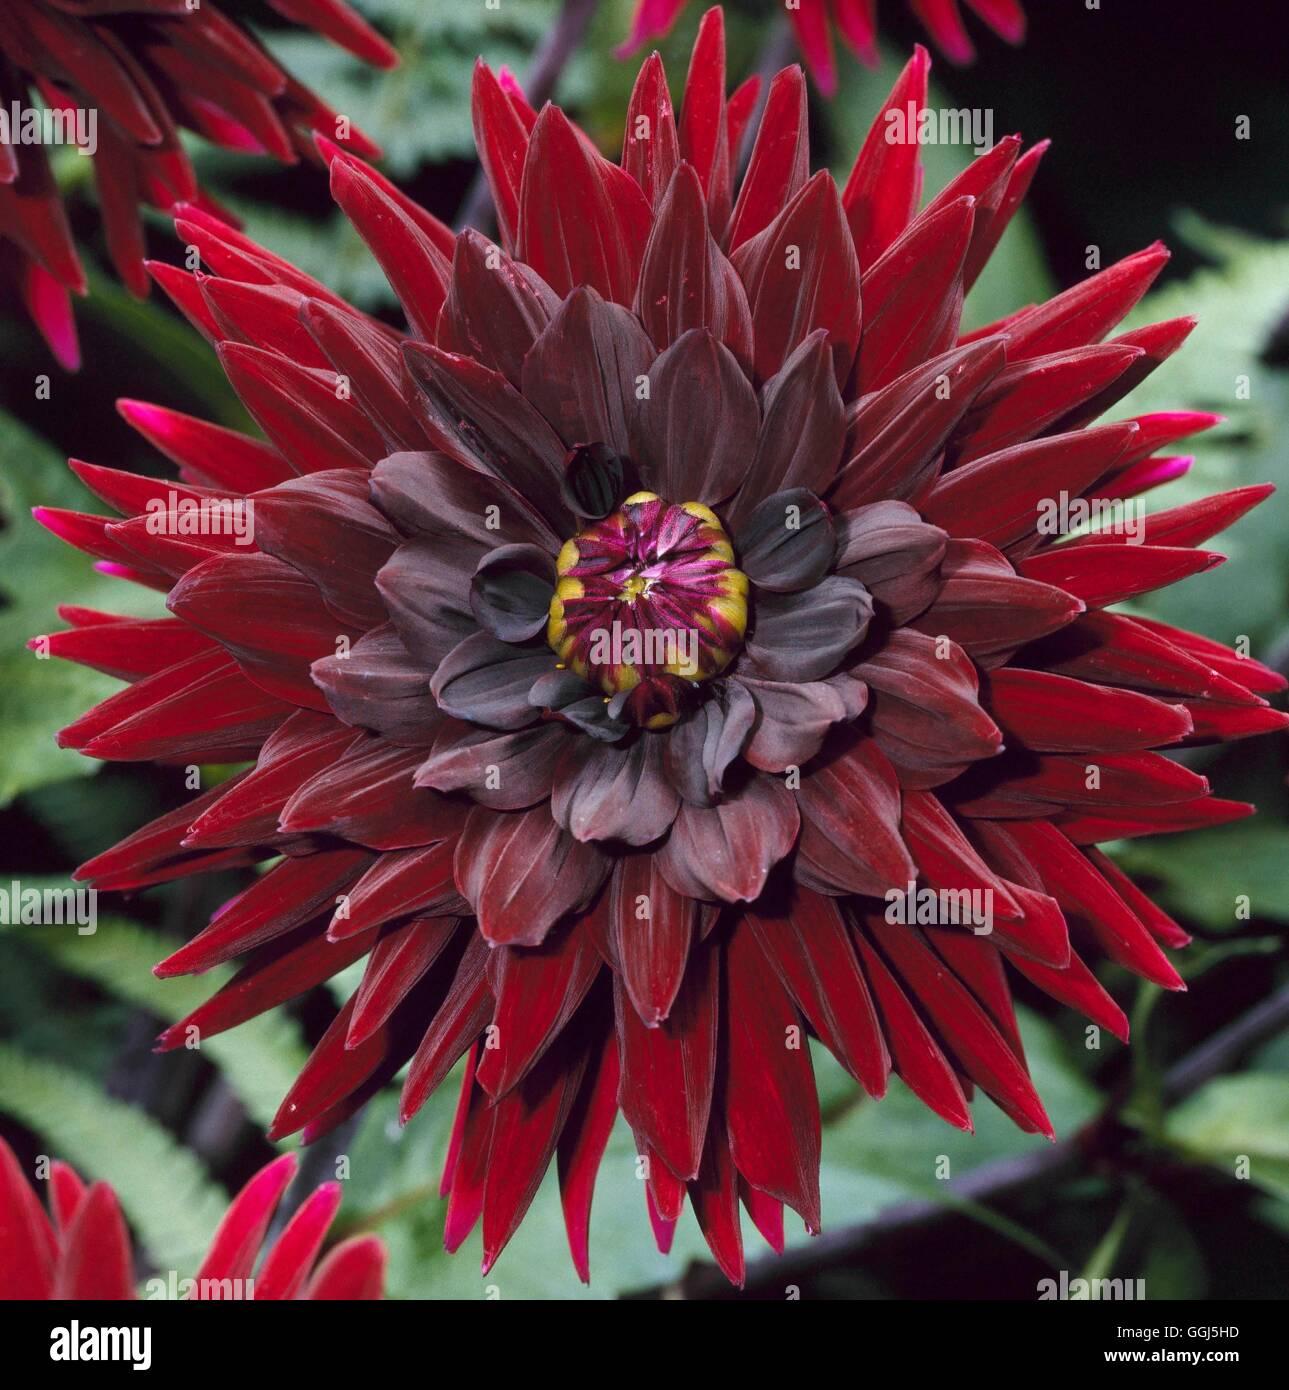 Dahlia - `Dark Stranger' AGM - (Small Semi-cactus)   BUL081766 - Stock Image